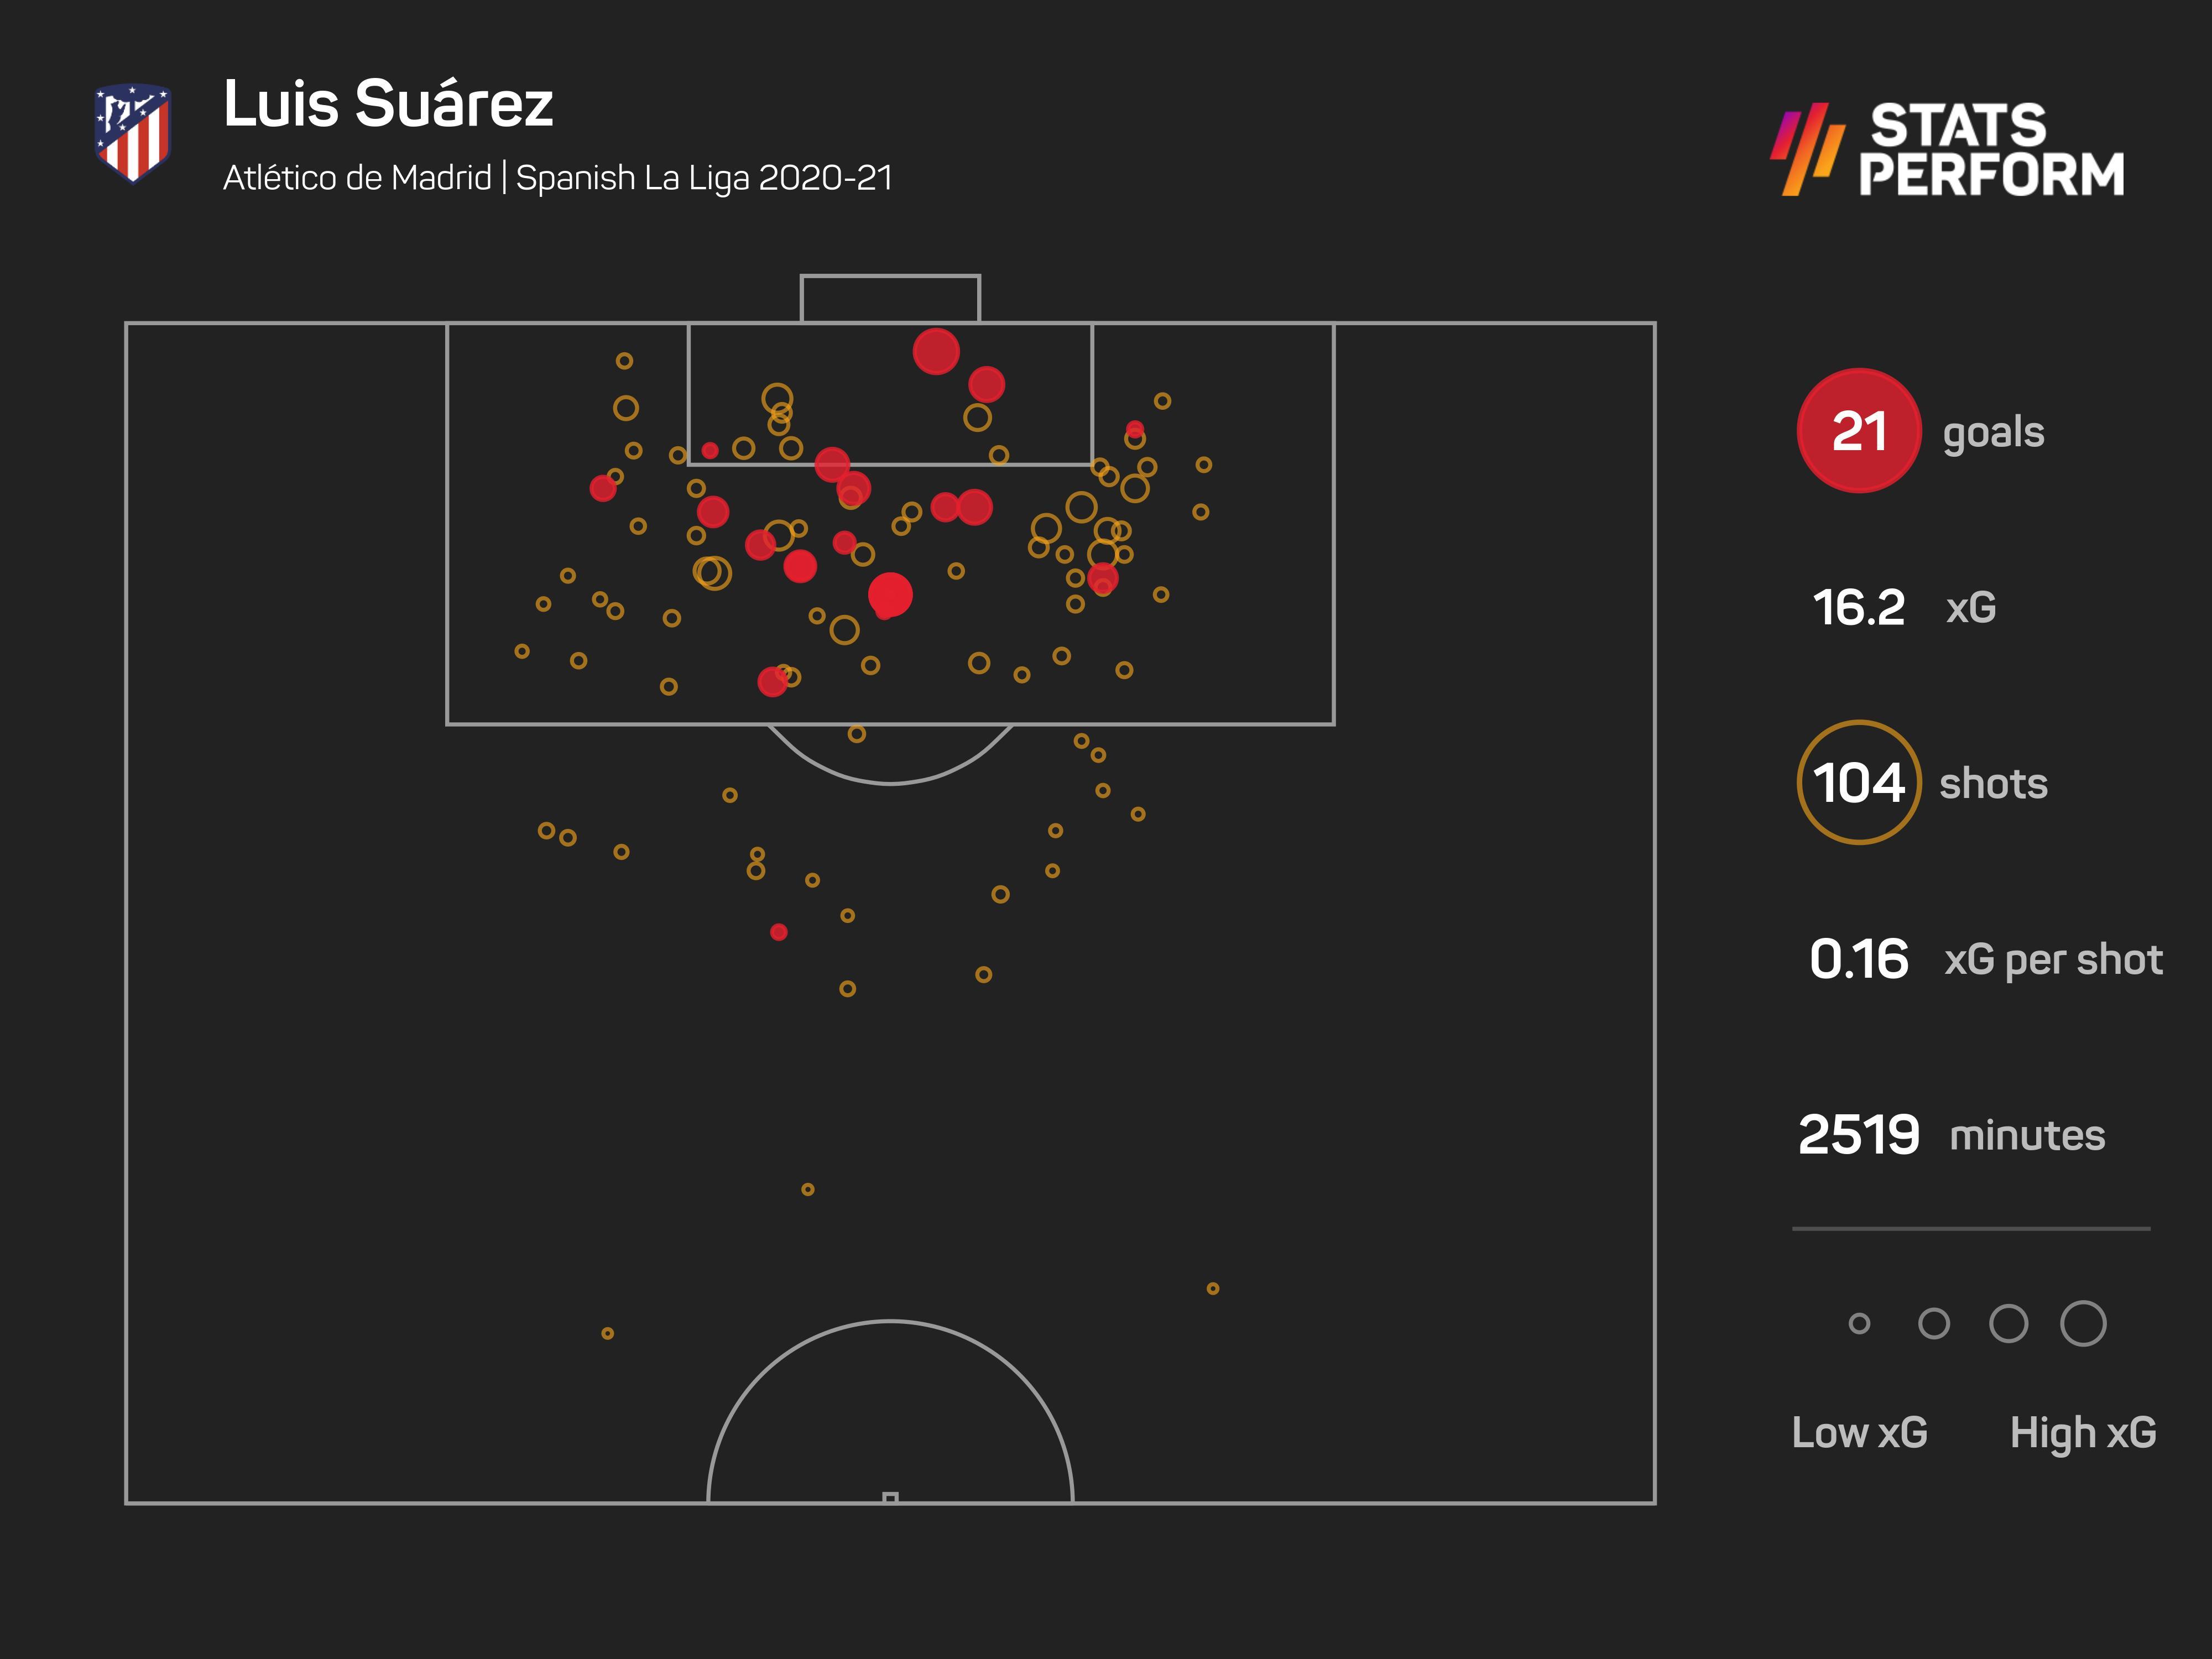 Luis Suarez xG 2020-21